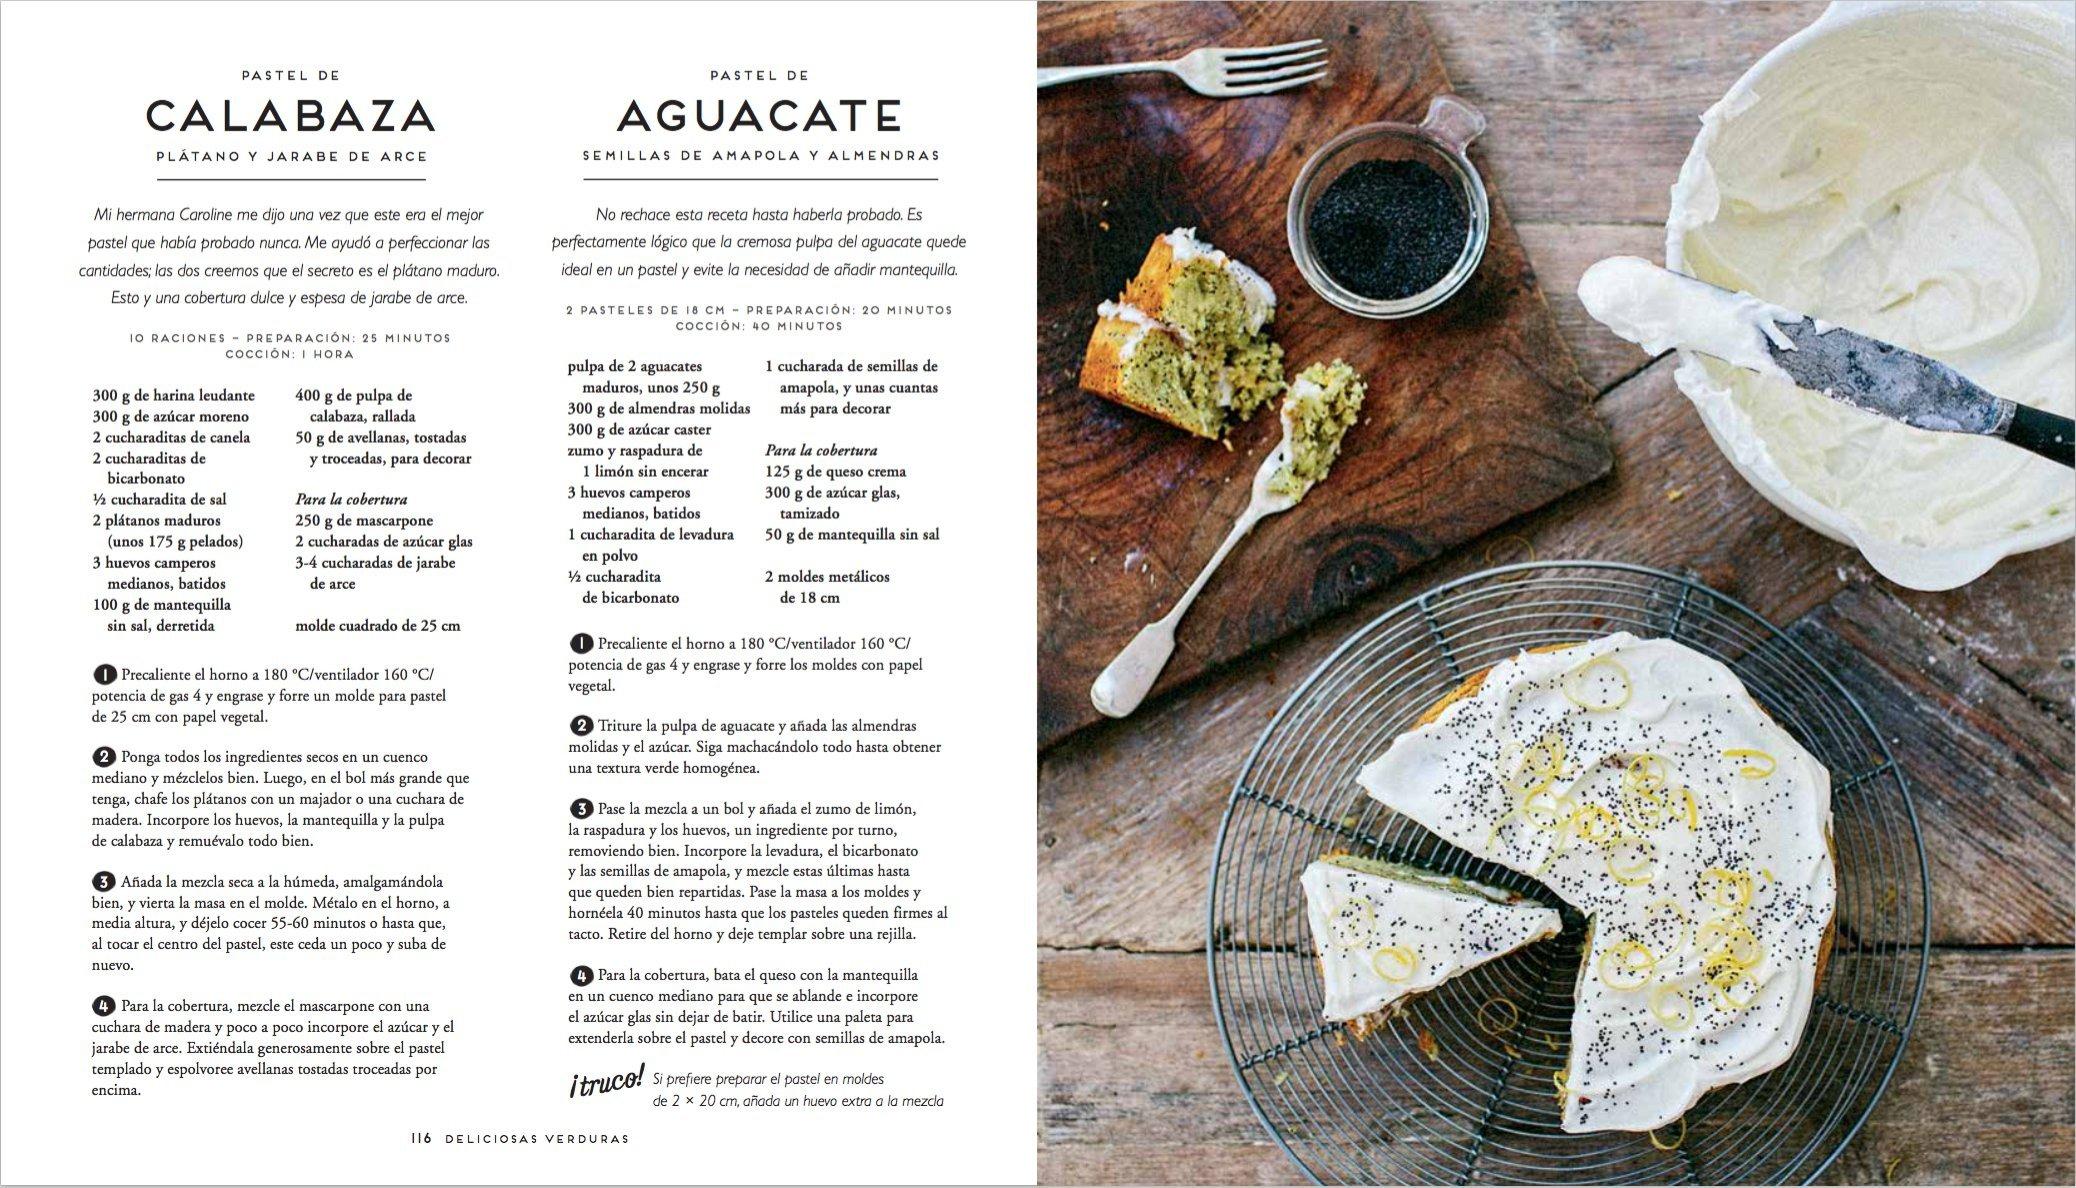 Deliciosas verduras (Spanish Edition): Georgina Fuggle: 9788416407088: Amazon.com: Books